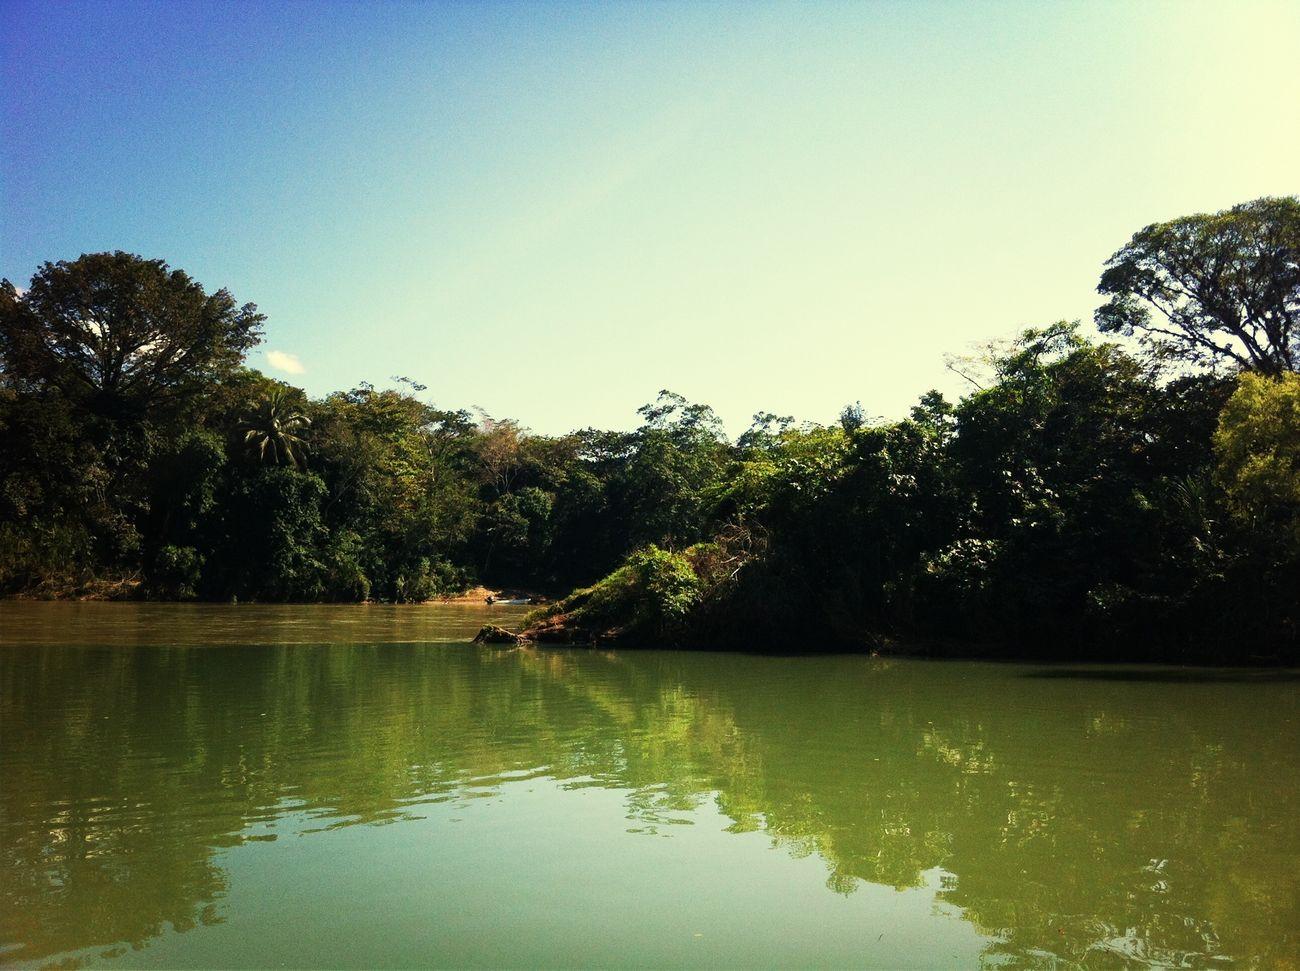 Verde más allá Tapijulapa, Tabasco Landscape Greenday